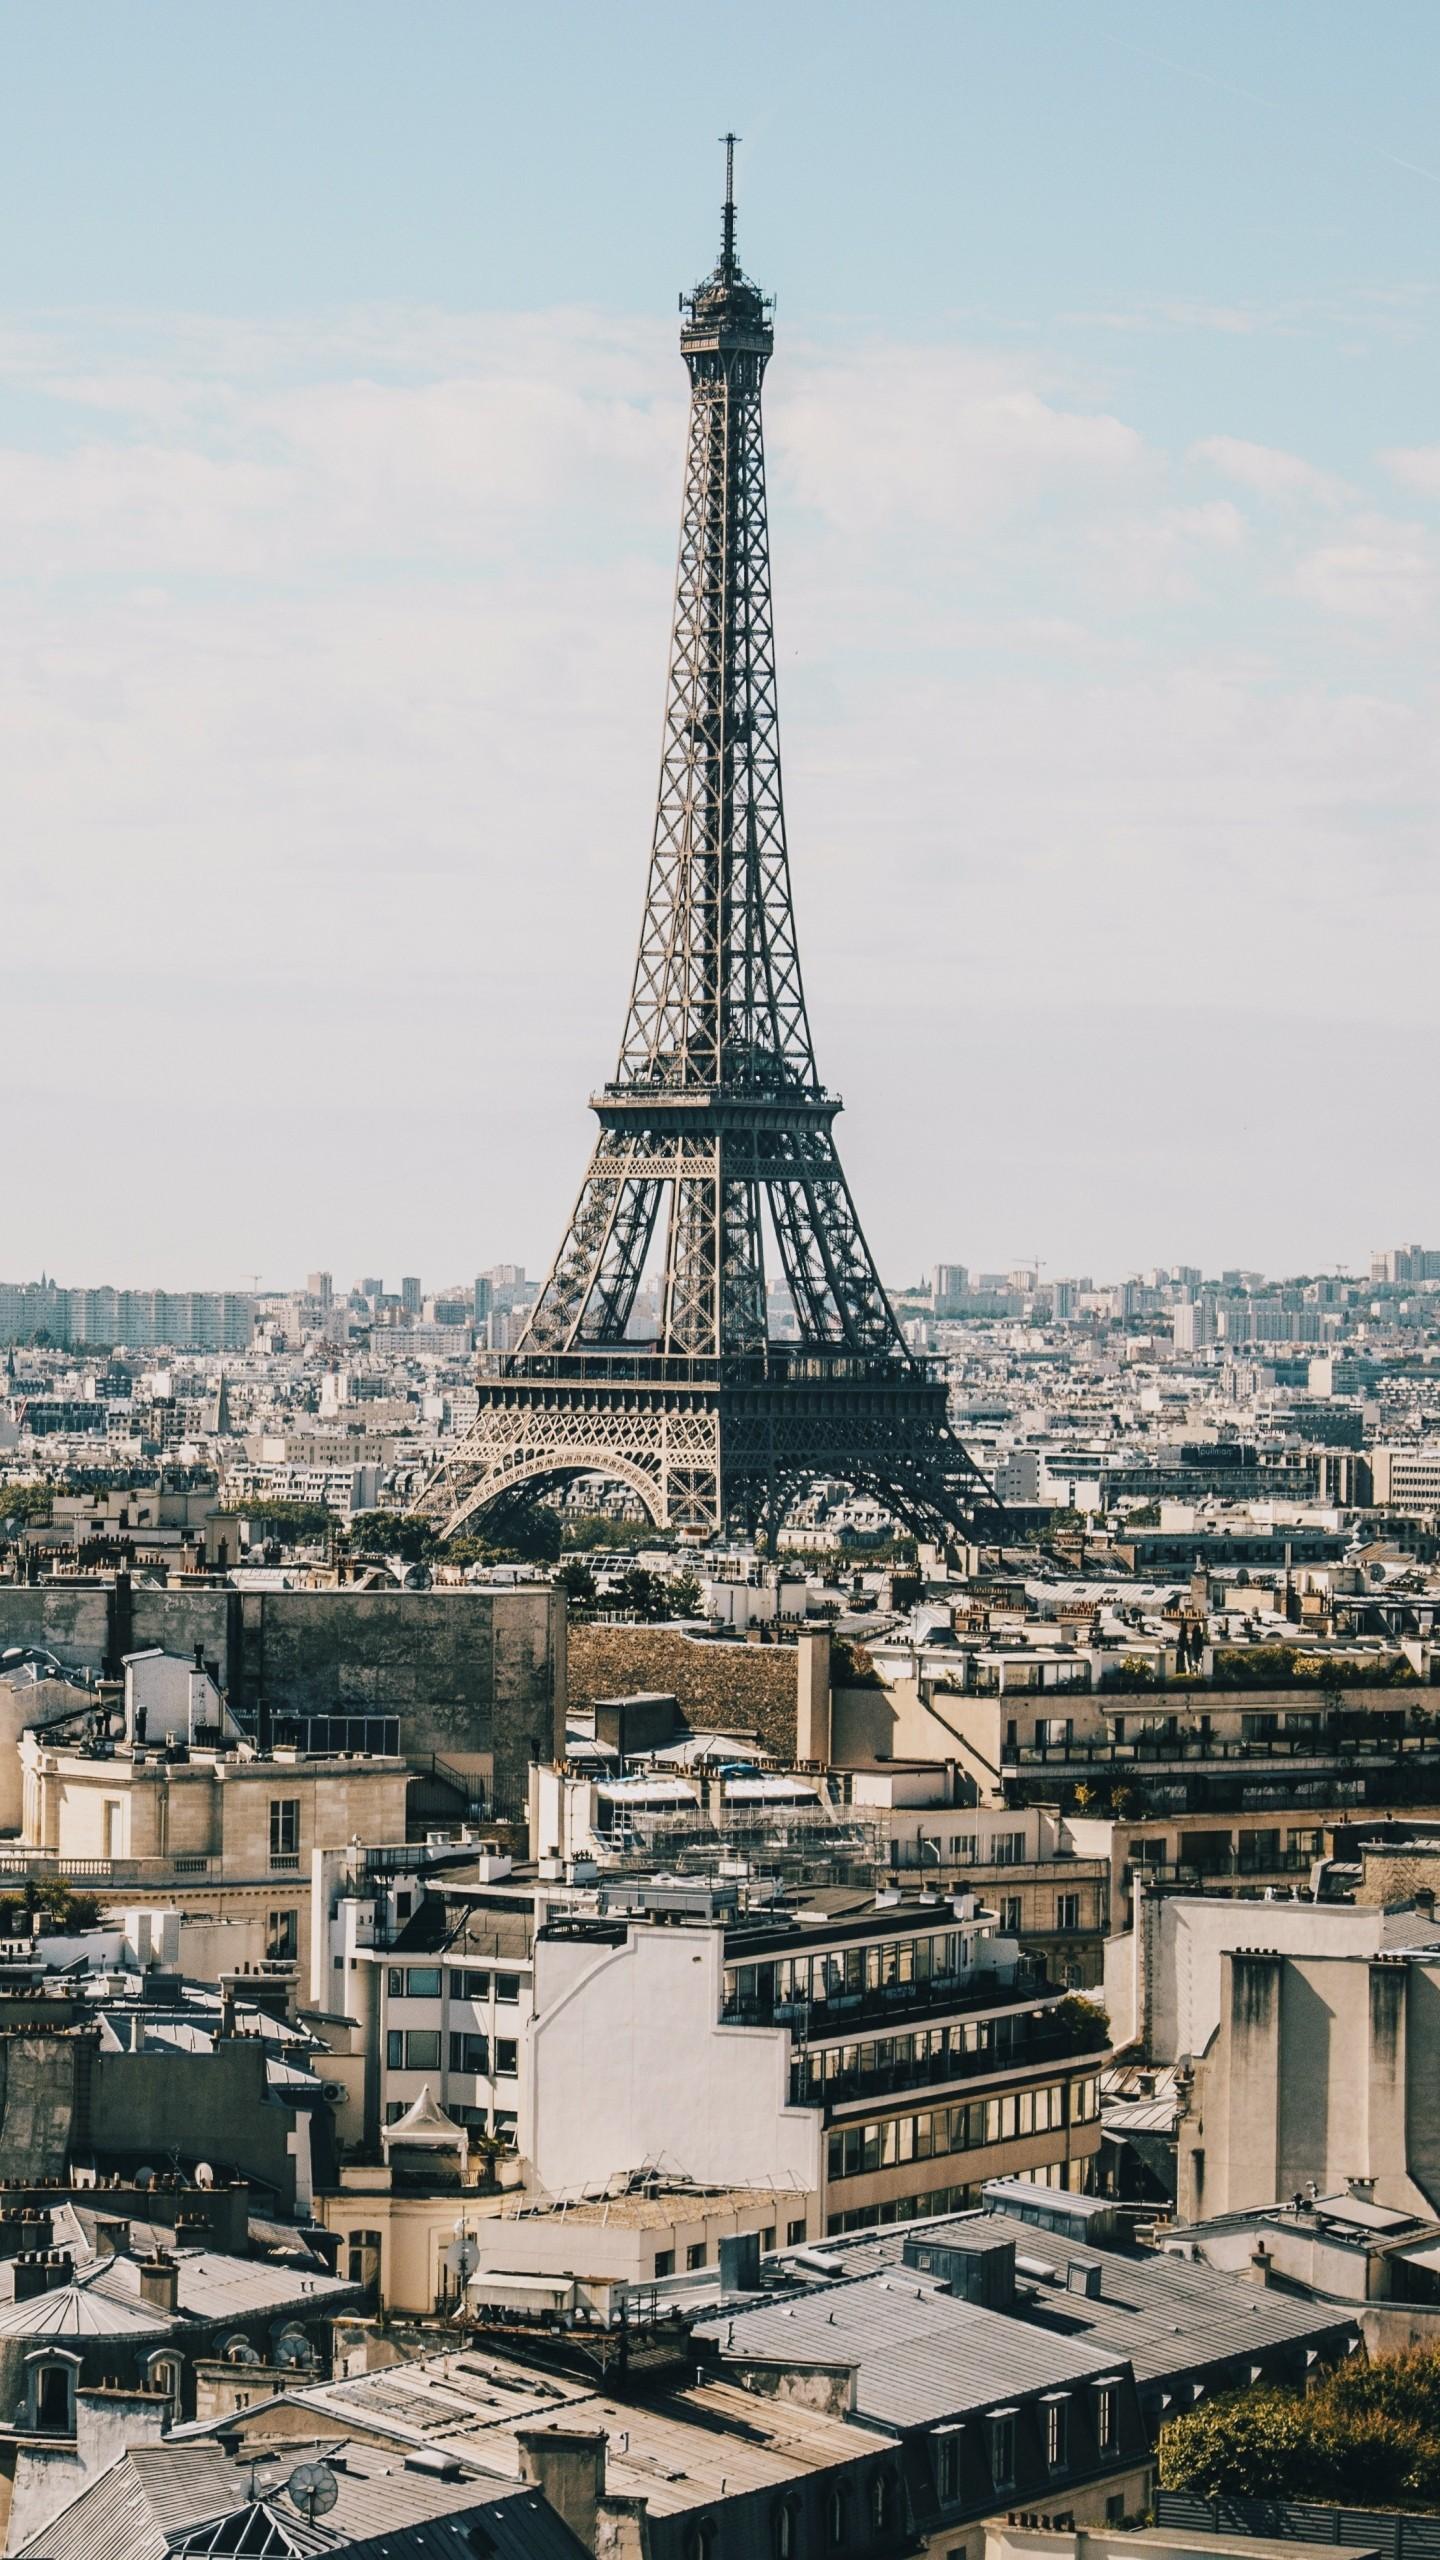 F1 2017 Car Wallpaper Eiffel Tower Paris Buildings Wallpaper 1440x2560